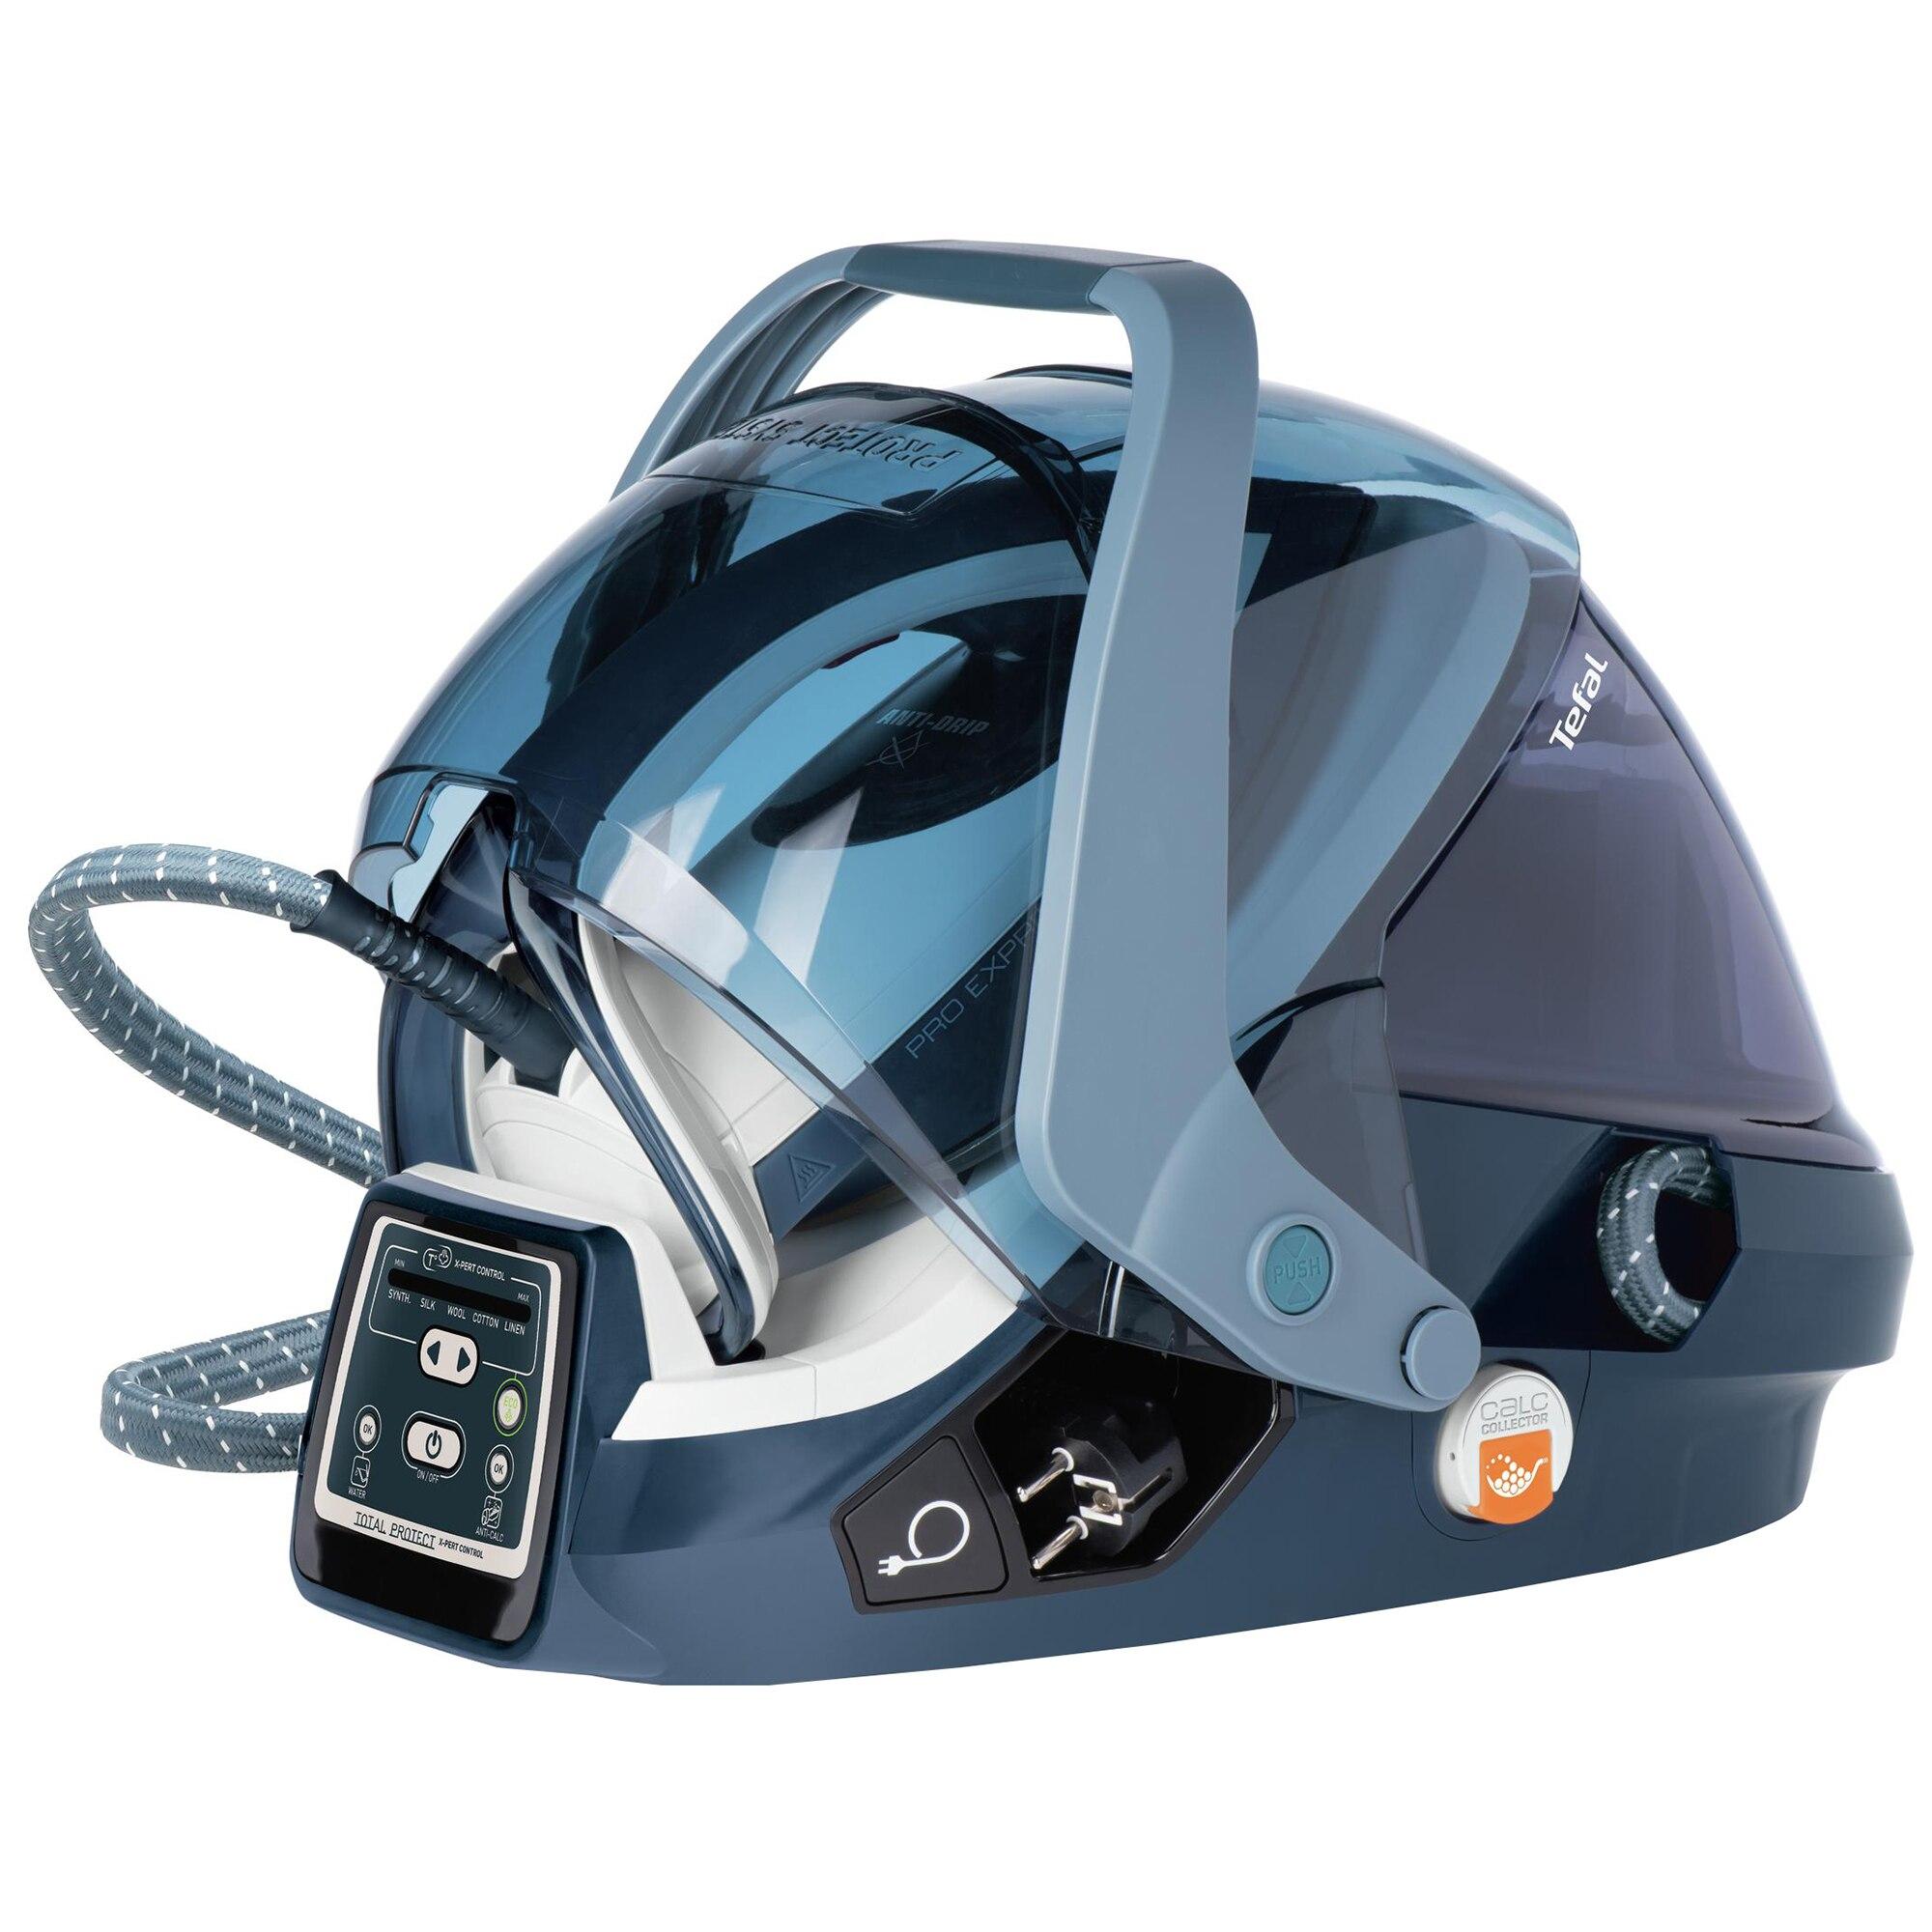 Fotografie Statie de calcat Tefal GV9080E0 Pro Express X-Pert Care, 2400W, 500g/min, 120g/min, Talpa Autoclean Durilium, 7.5 bari, 5 setari, Protect System, 1.6l, Alb/Albastru